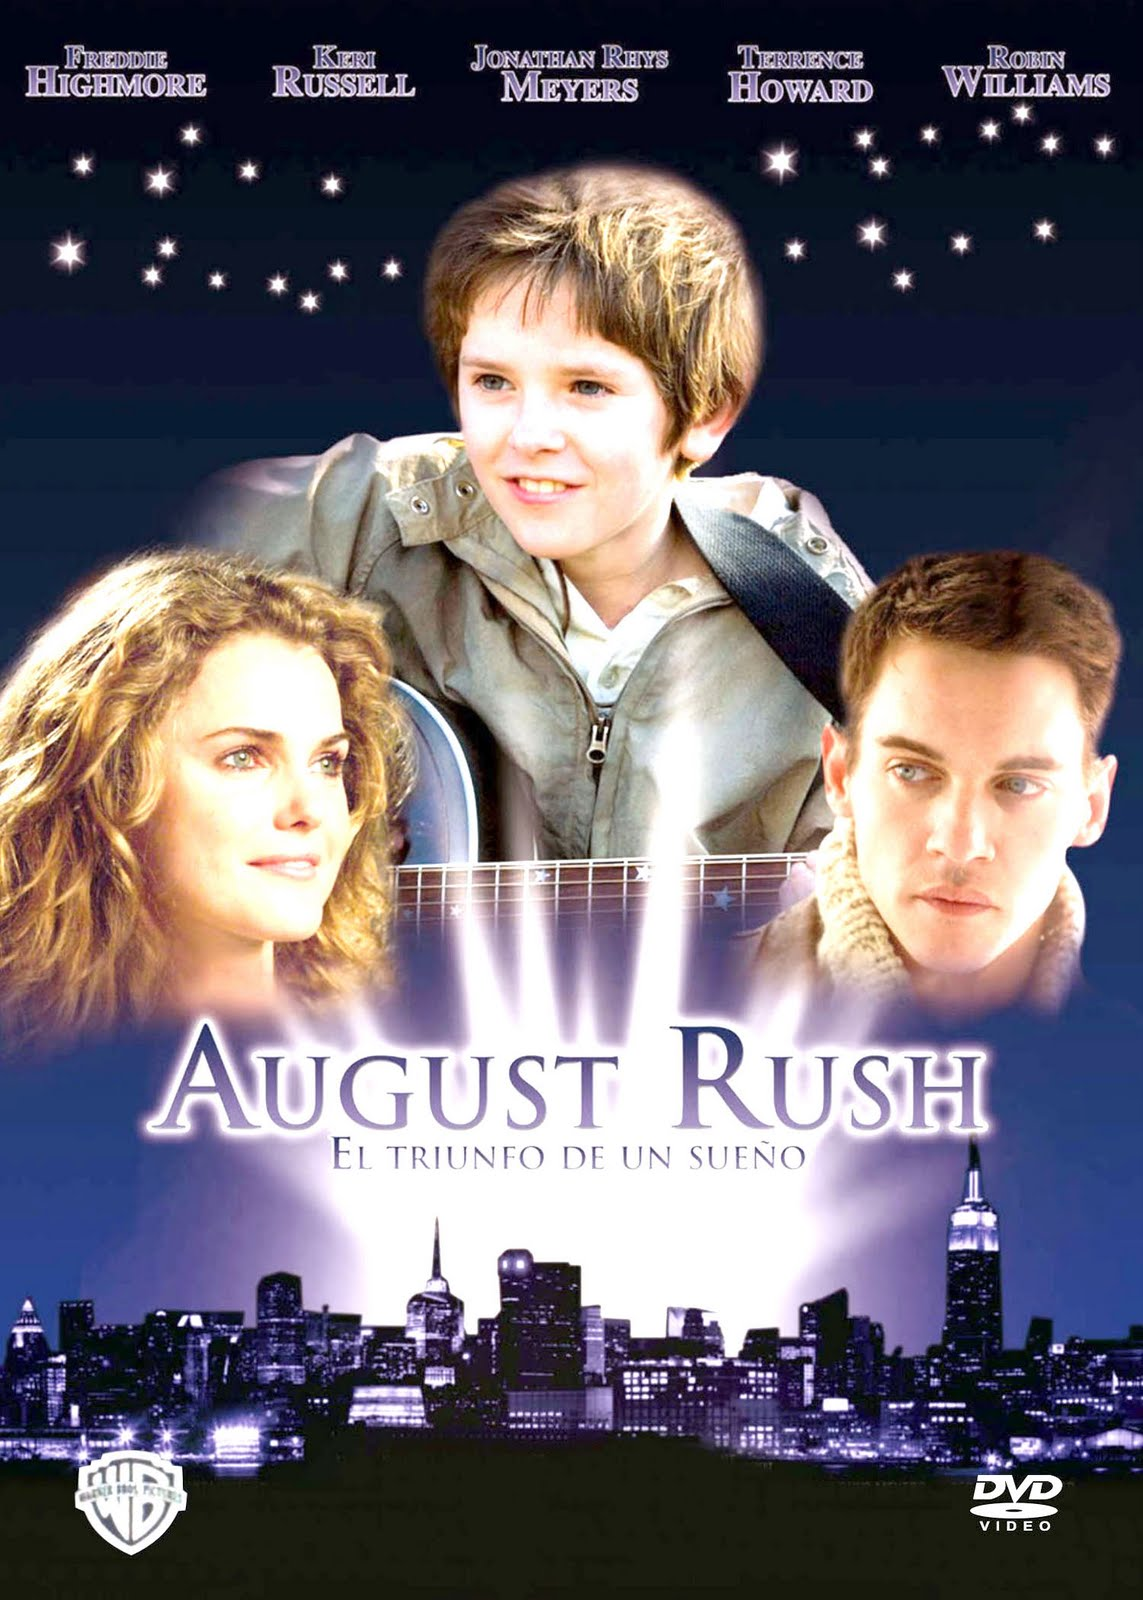 Jonathan Rhys Meyers Wallpaper August Rush Wallpaper